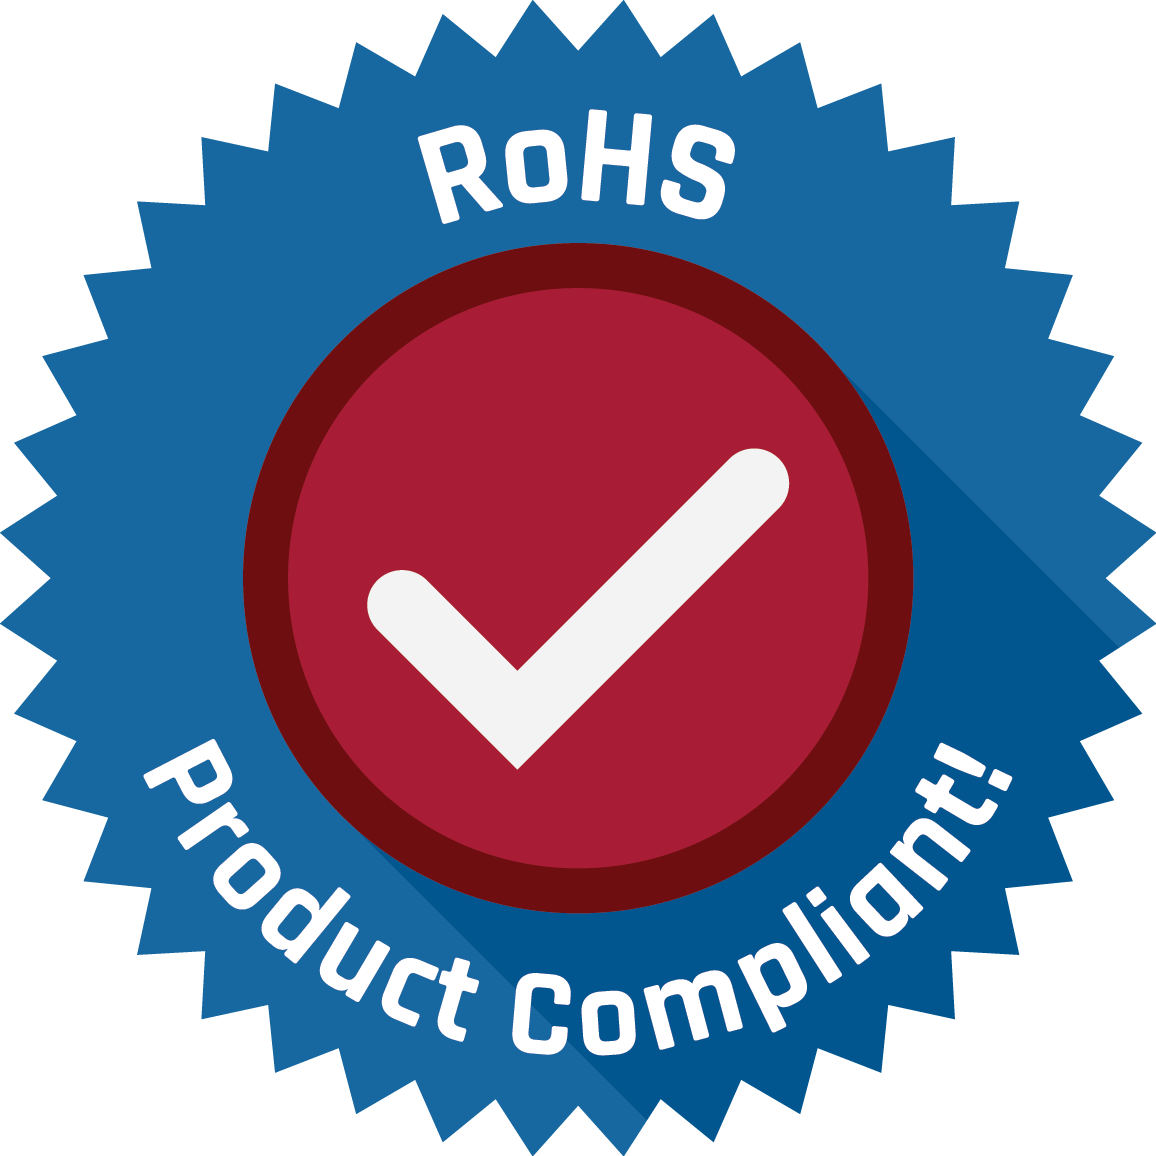 RoHS Compliant Manufacturer.